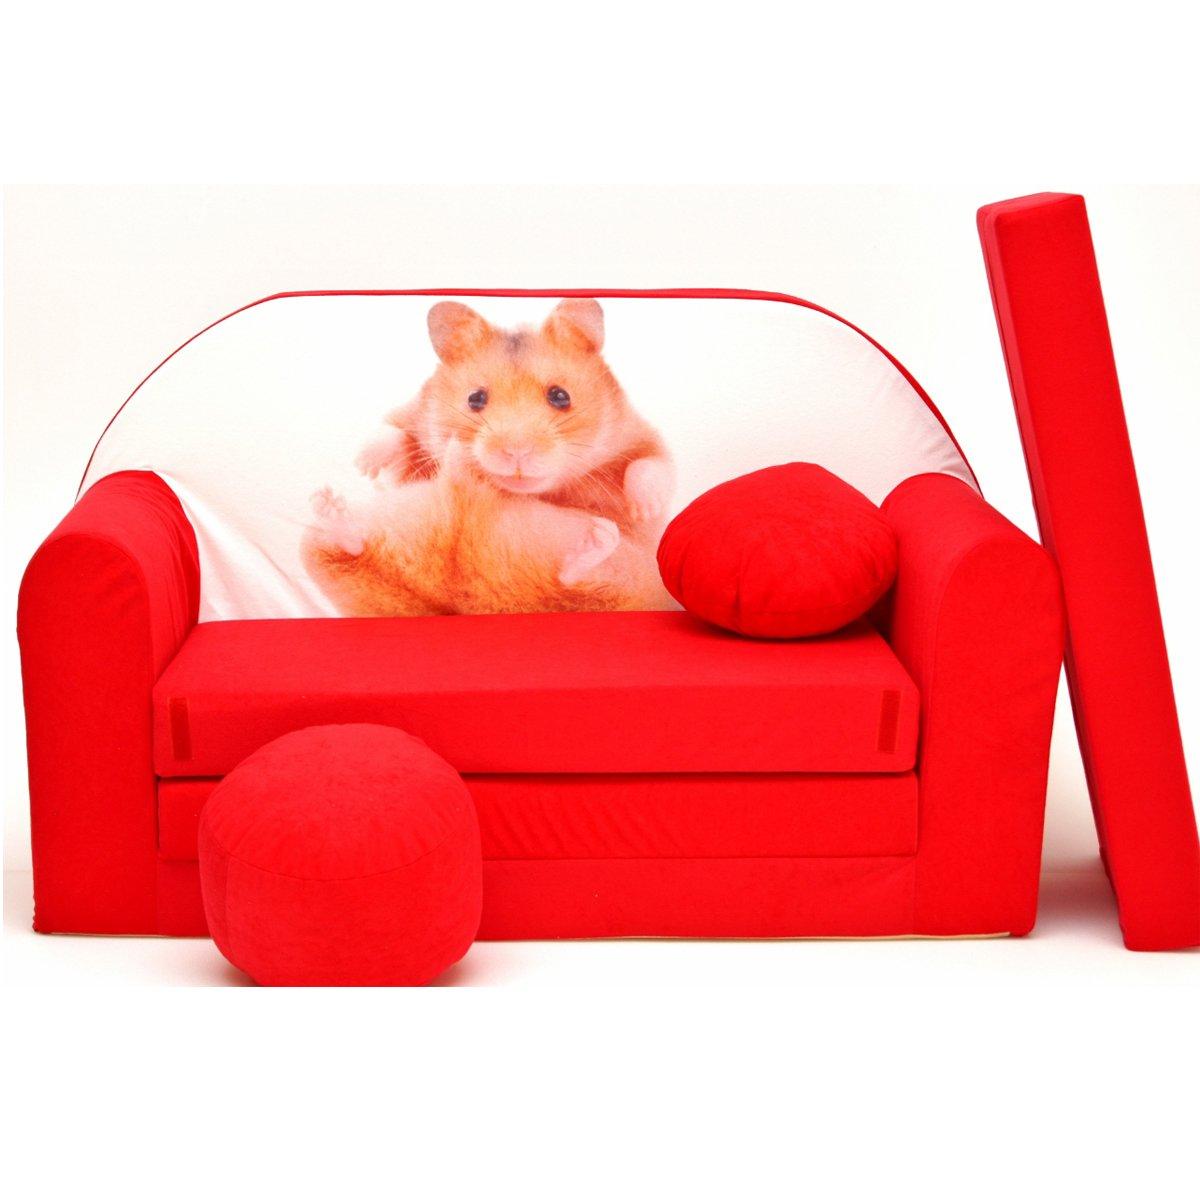 d37 de B Niños Bar Dormir emergente sofá sofá sofá Mini sofá 3 en 1 Baby Set + – Sillón infantil y asiento cojín + colchón